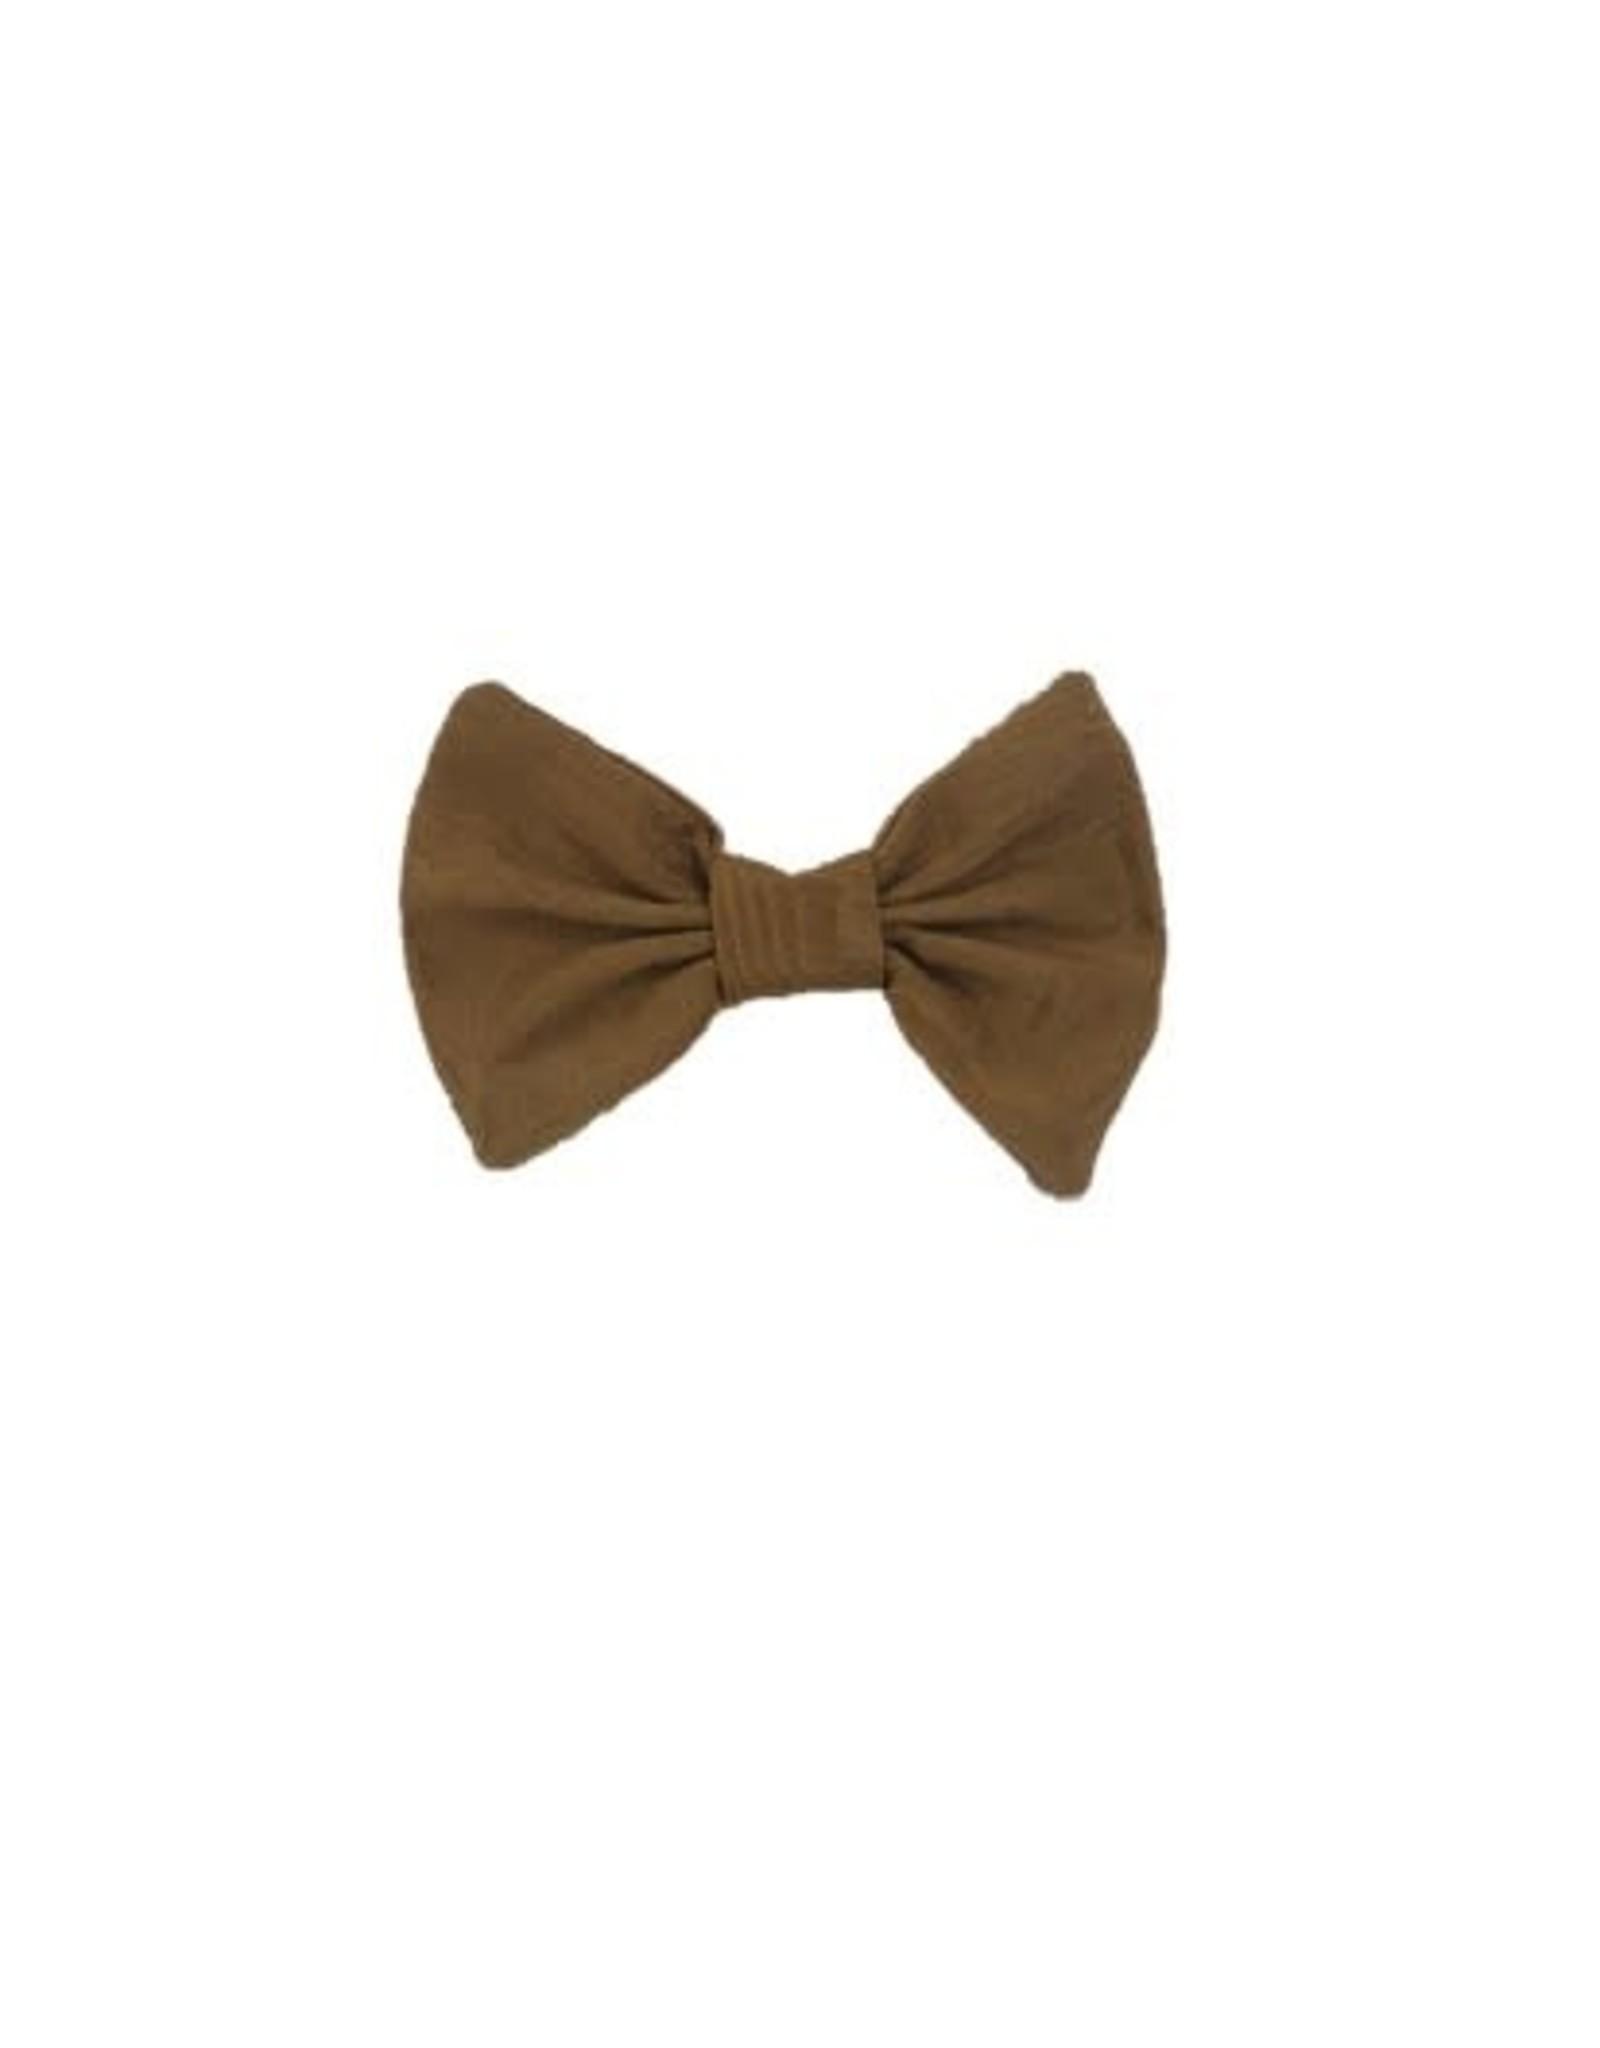 Karries Kostumes Handmade Gold Bow Tie